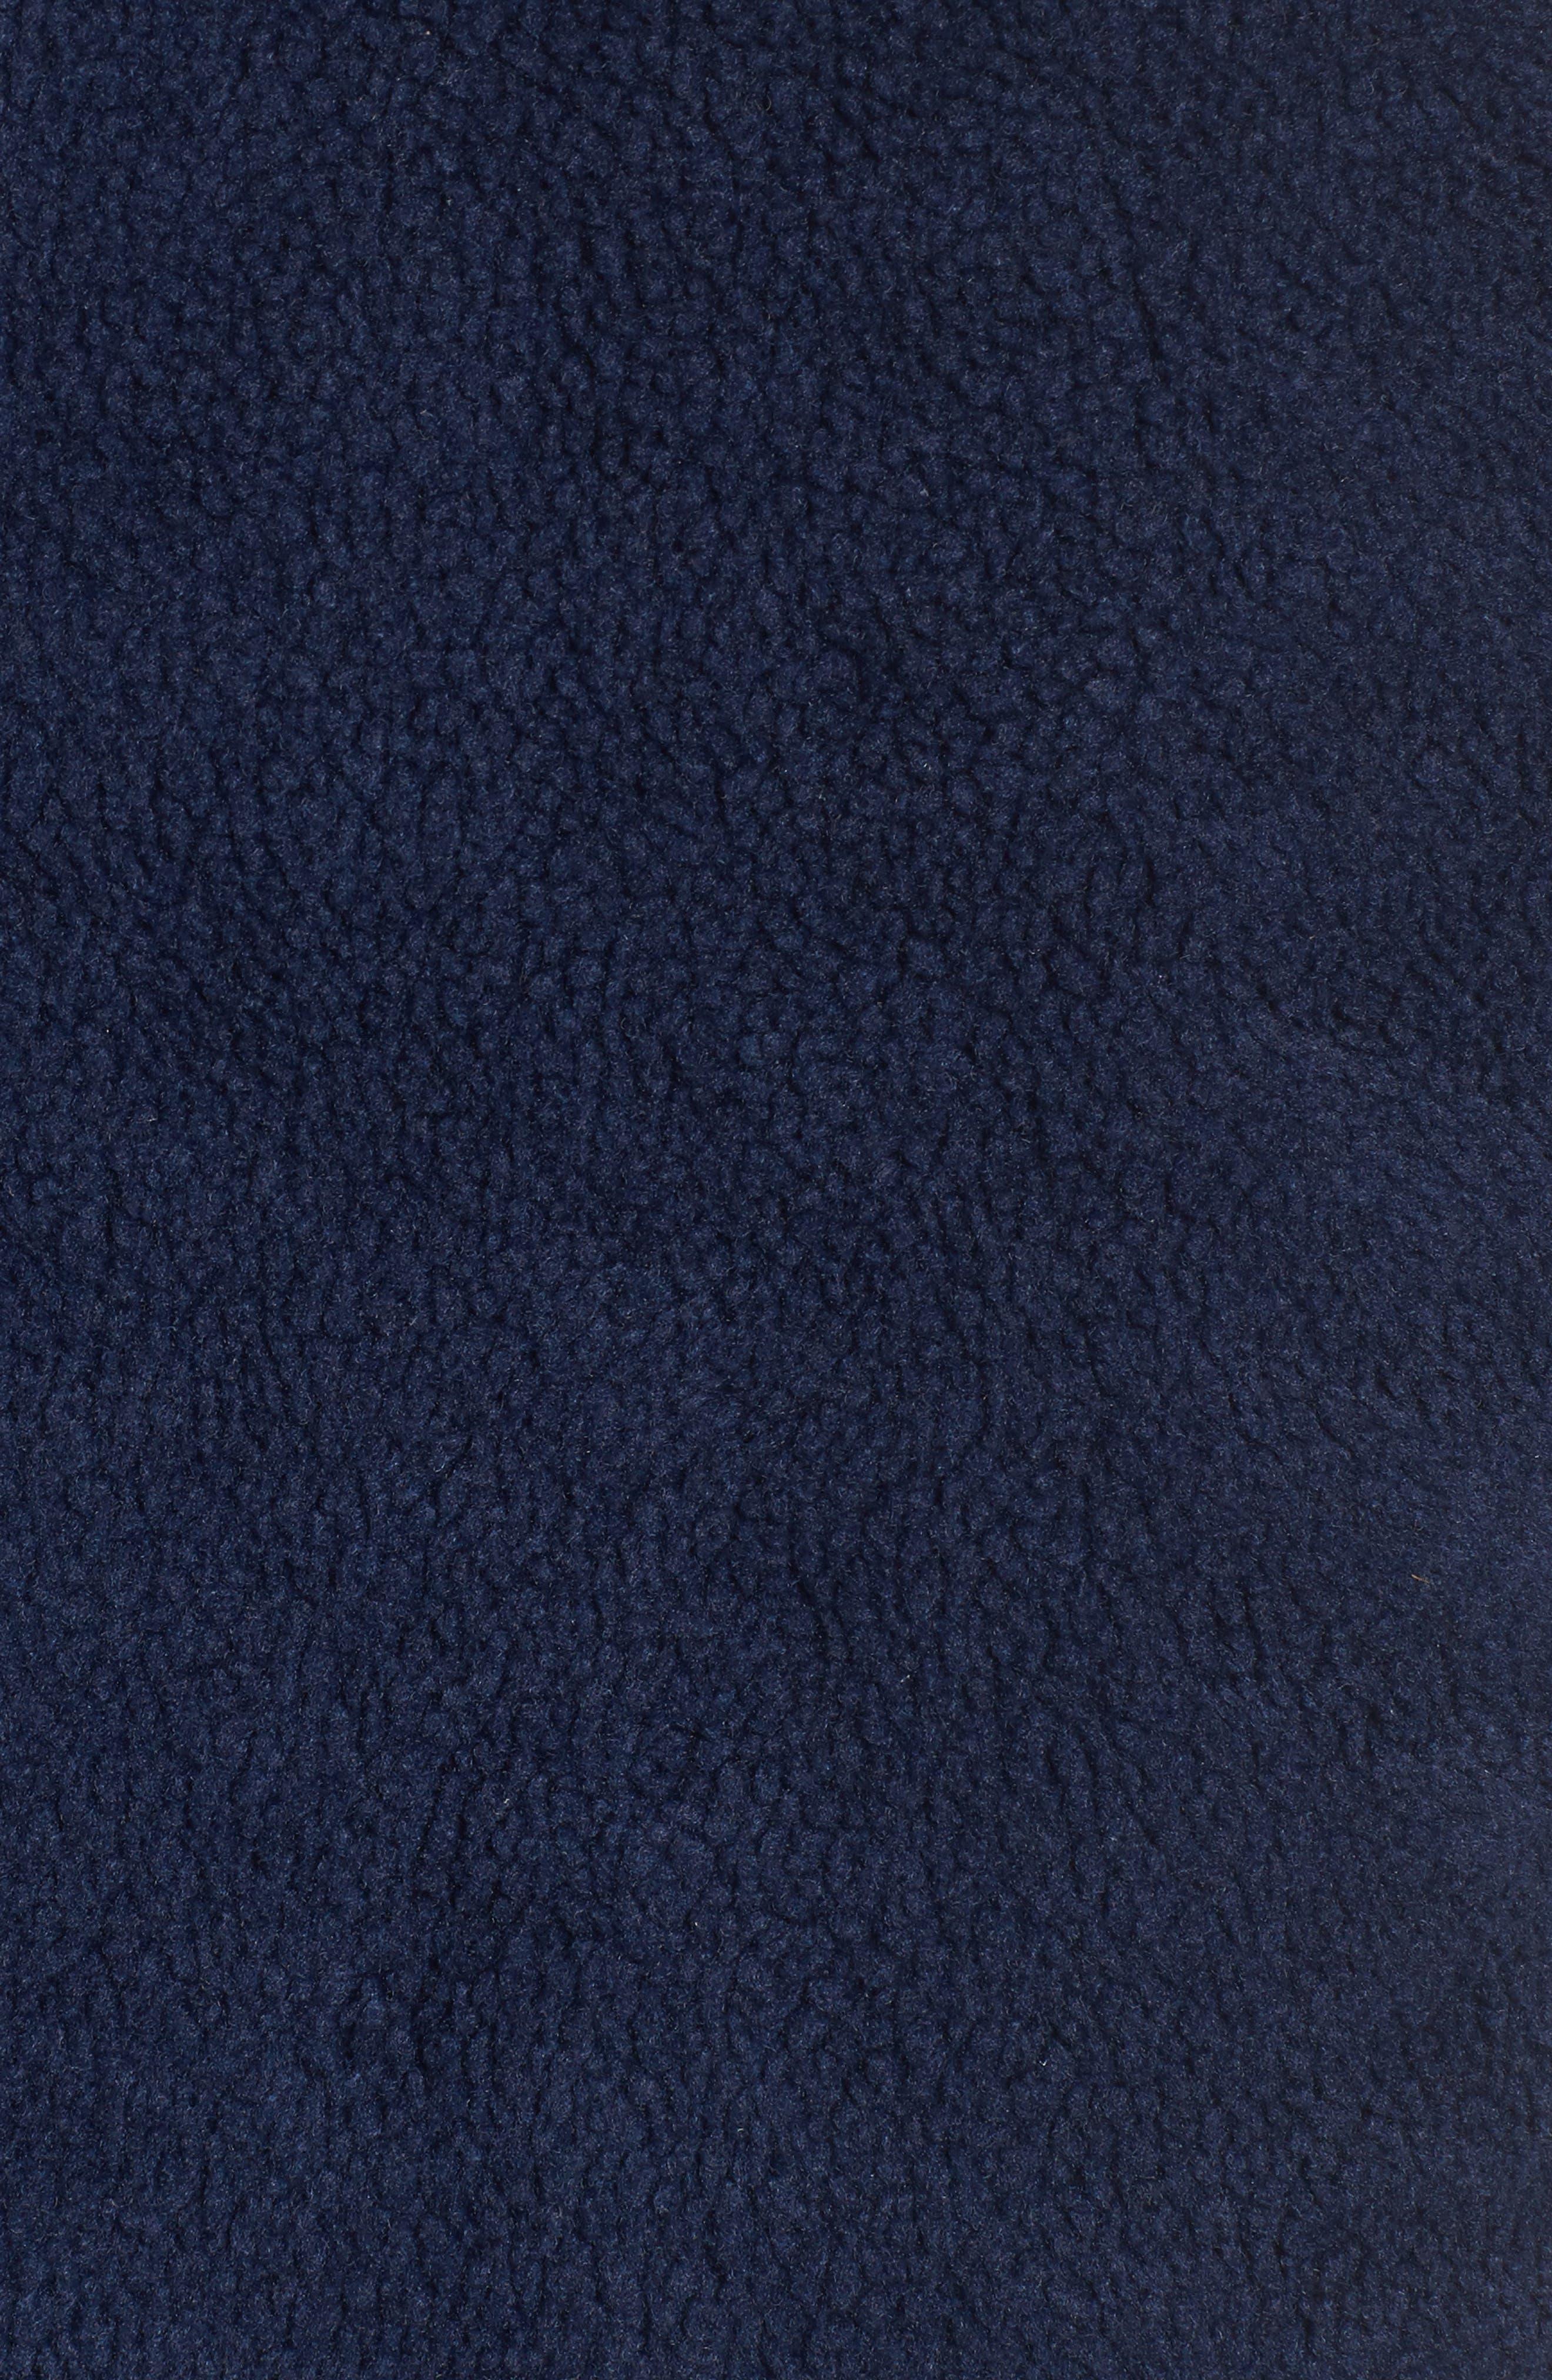 Reversible Quilted Plaid Vest,                             Alternate thumbnail 5, color,                             Deep Bay